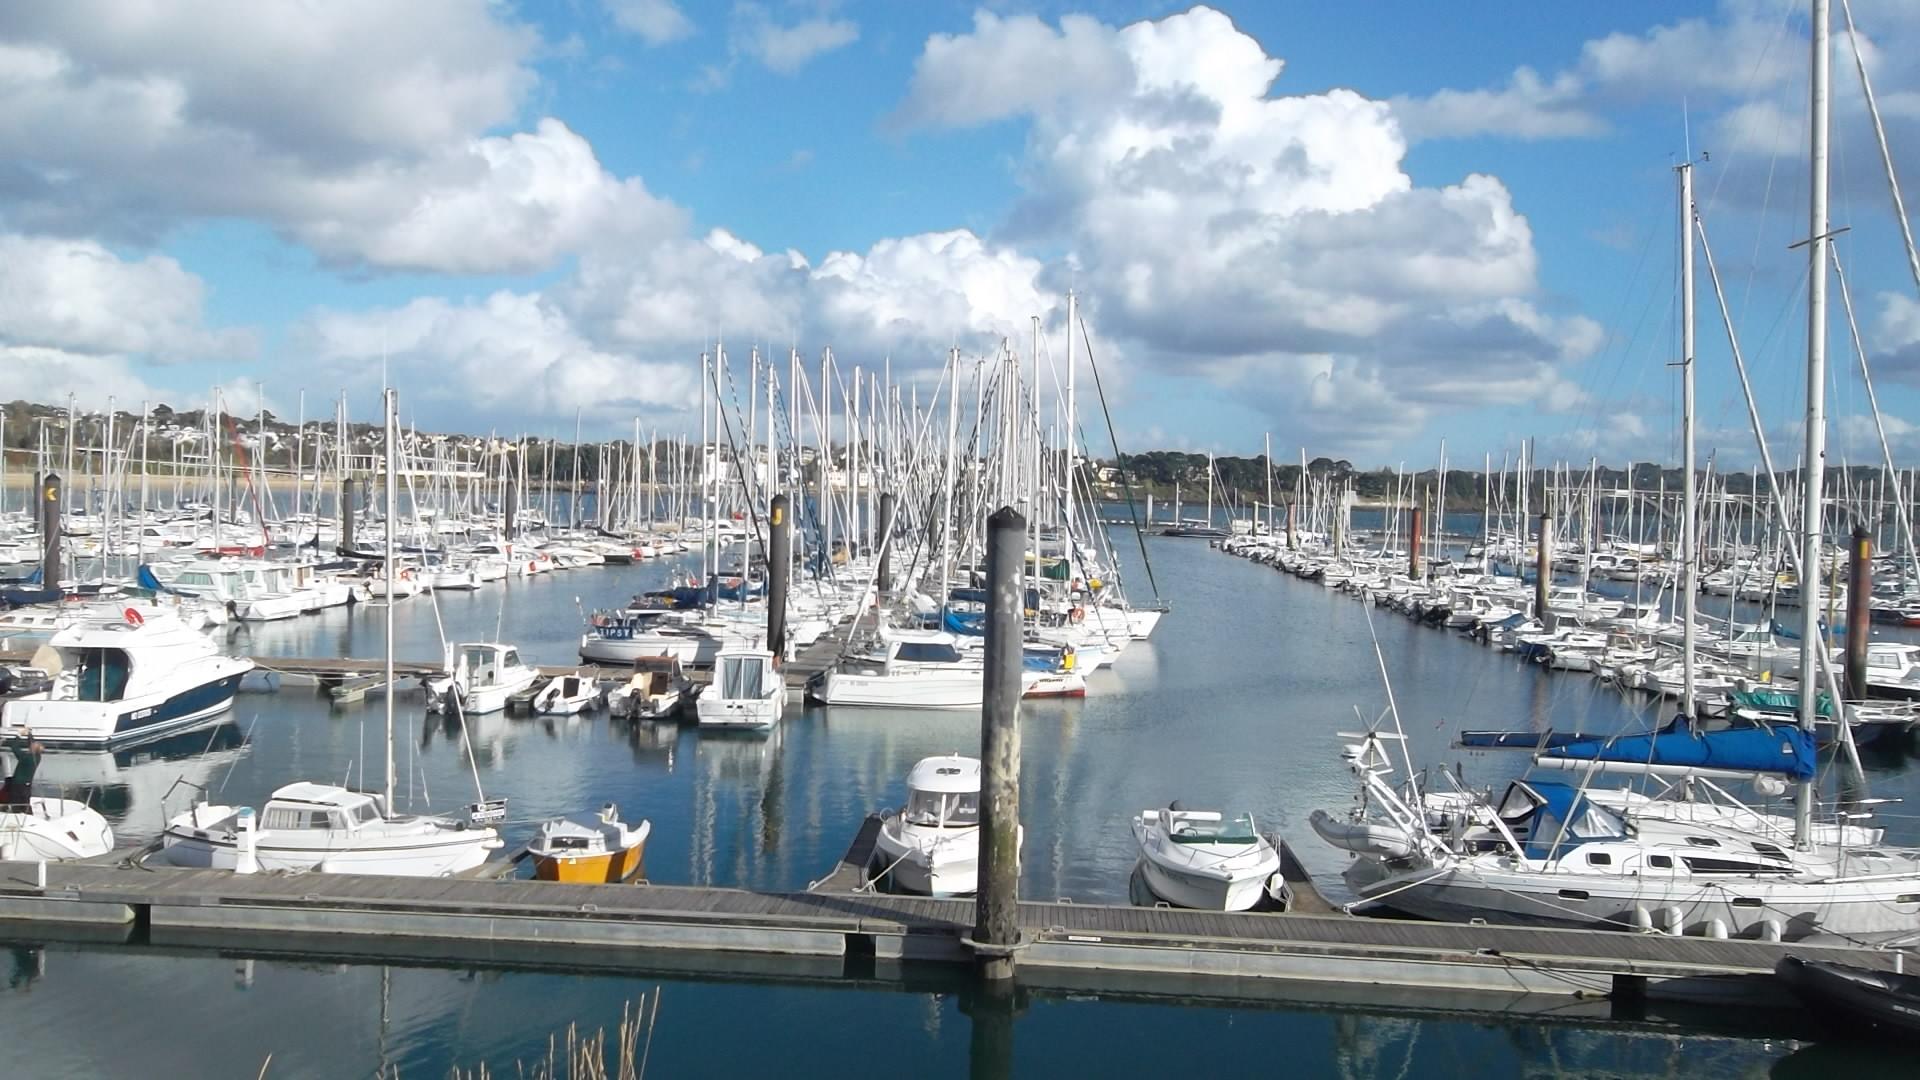 Brest port de moulin blanc nov12